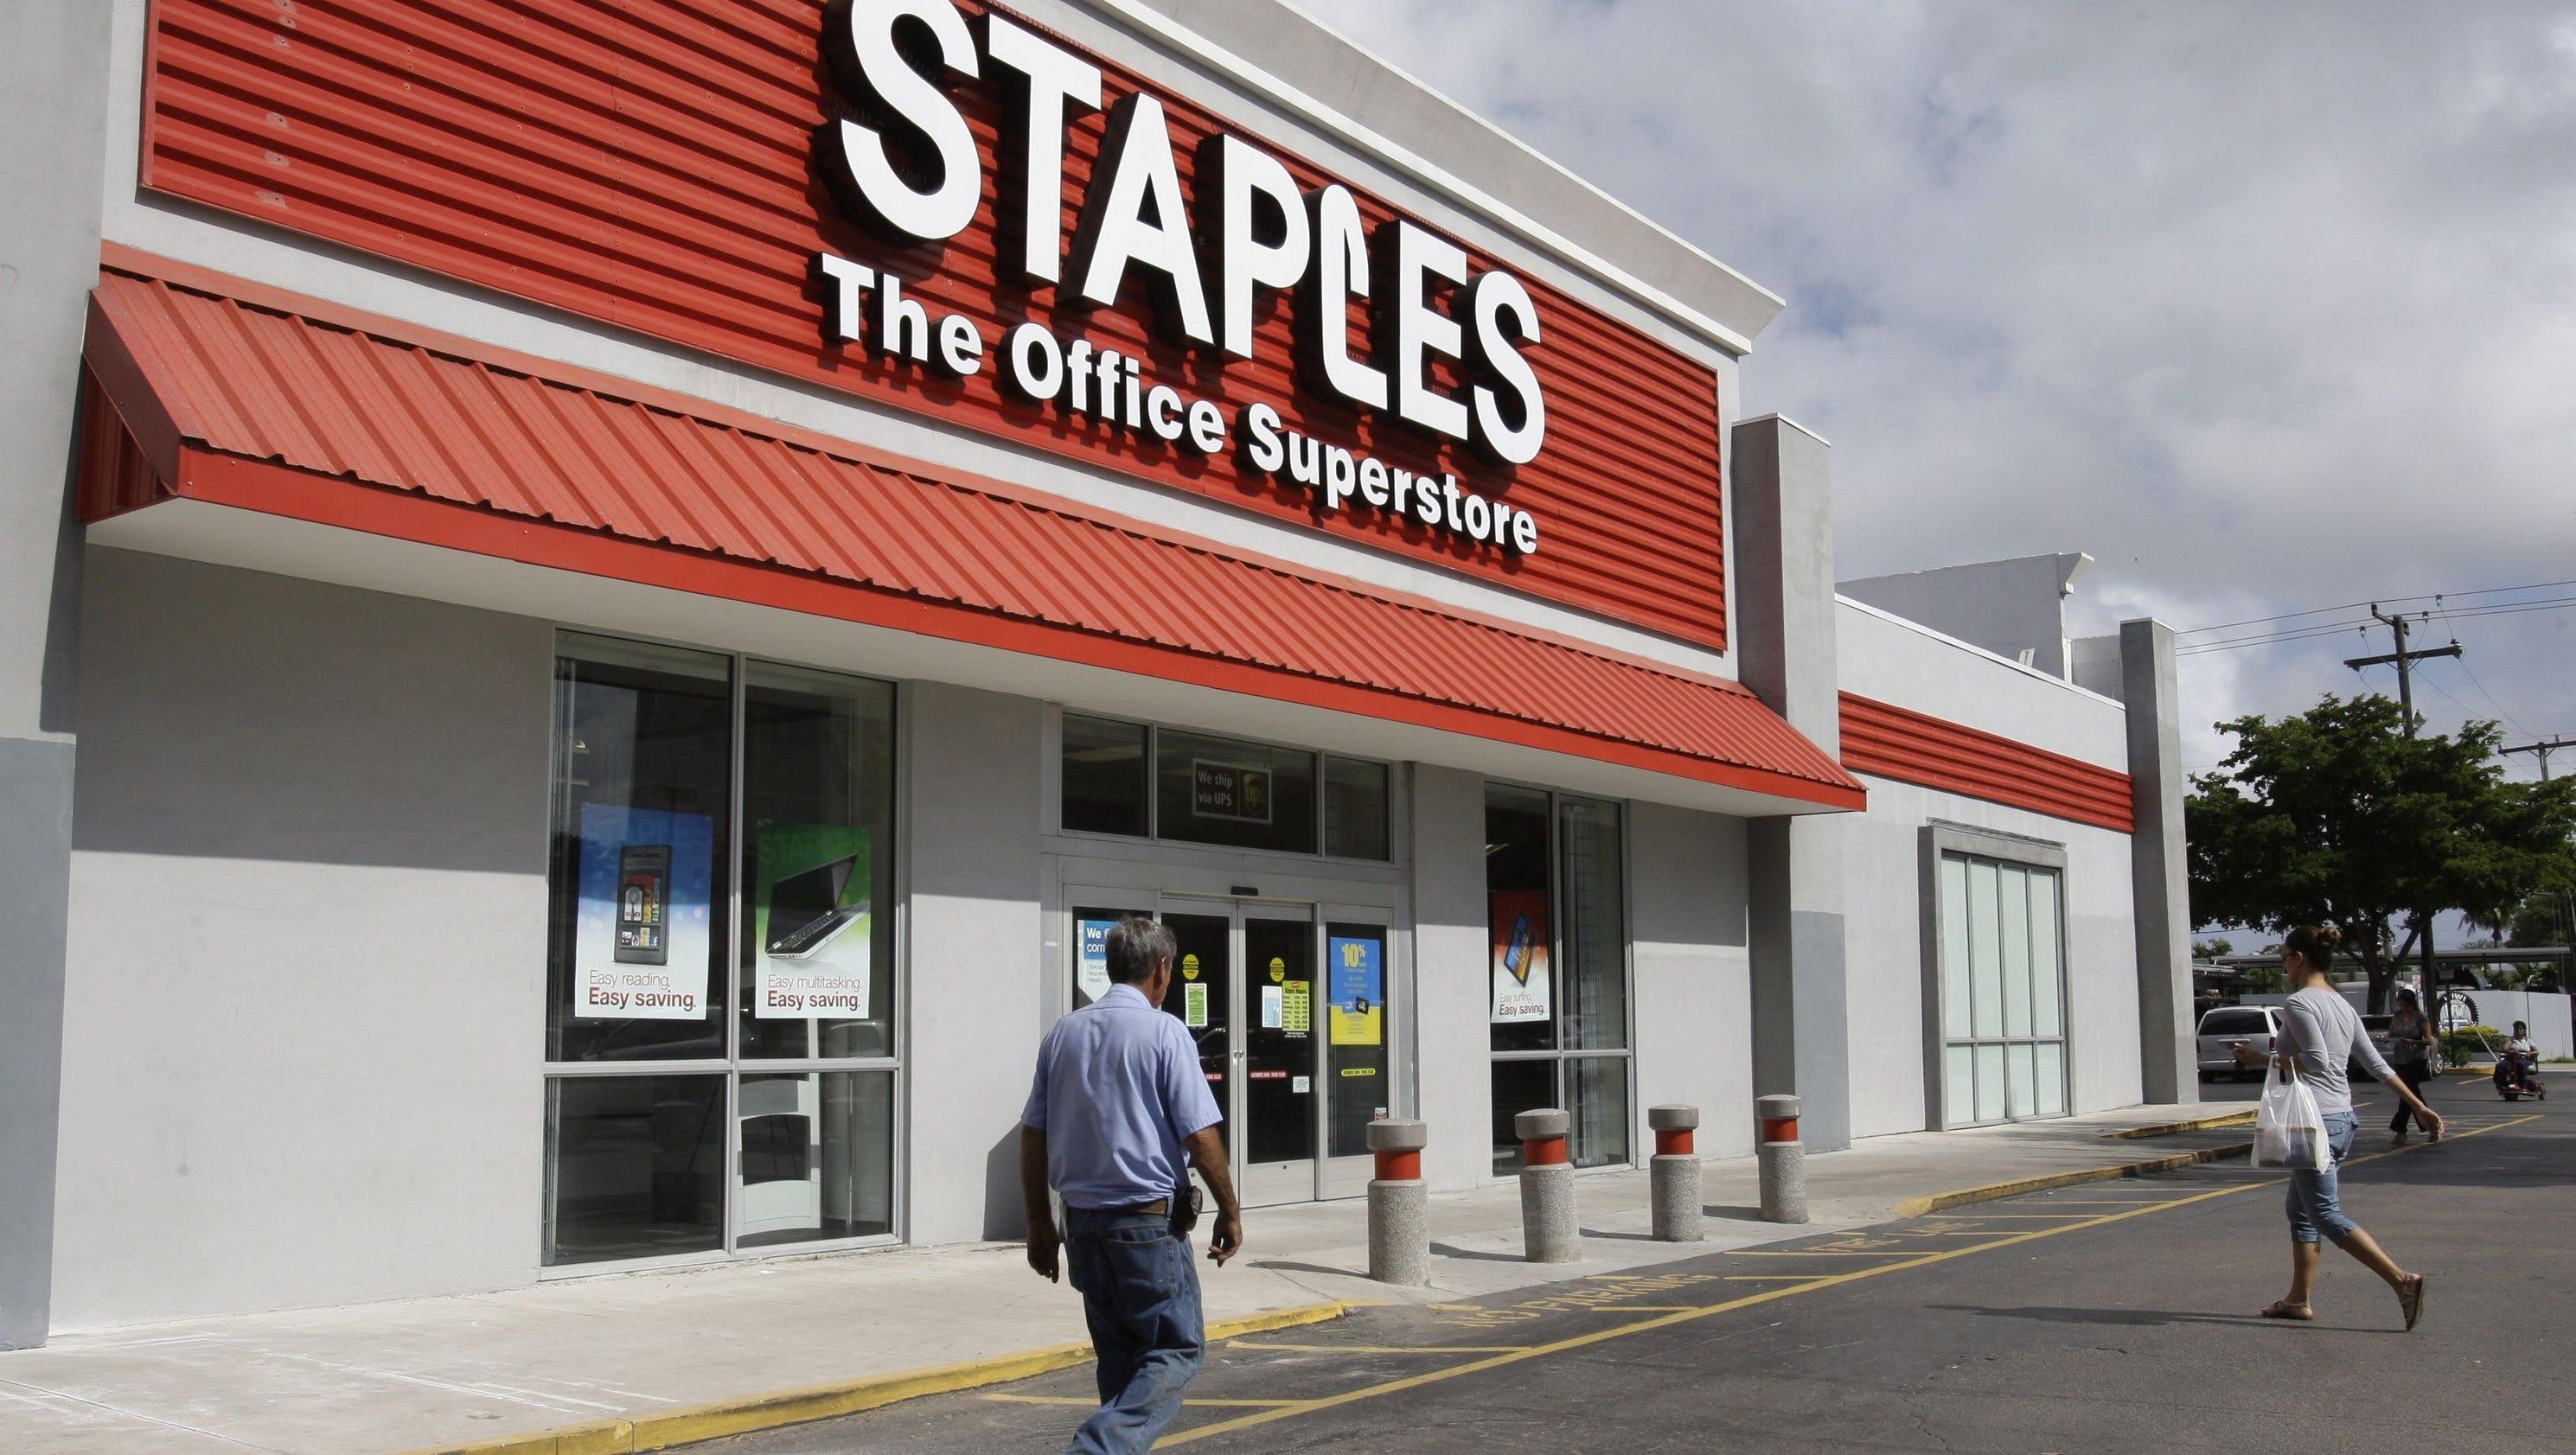 Staples fice Depot blast FTC over merger dispute